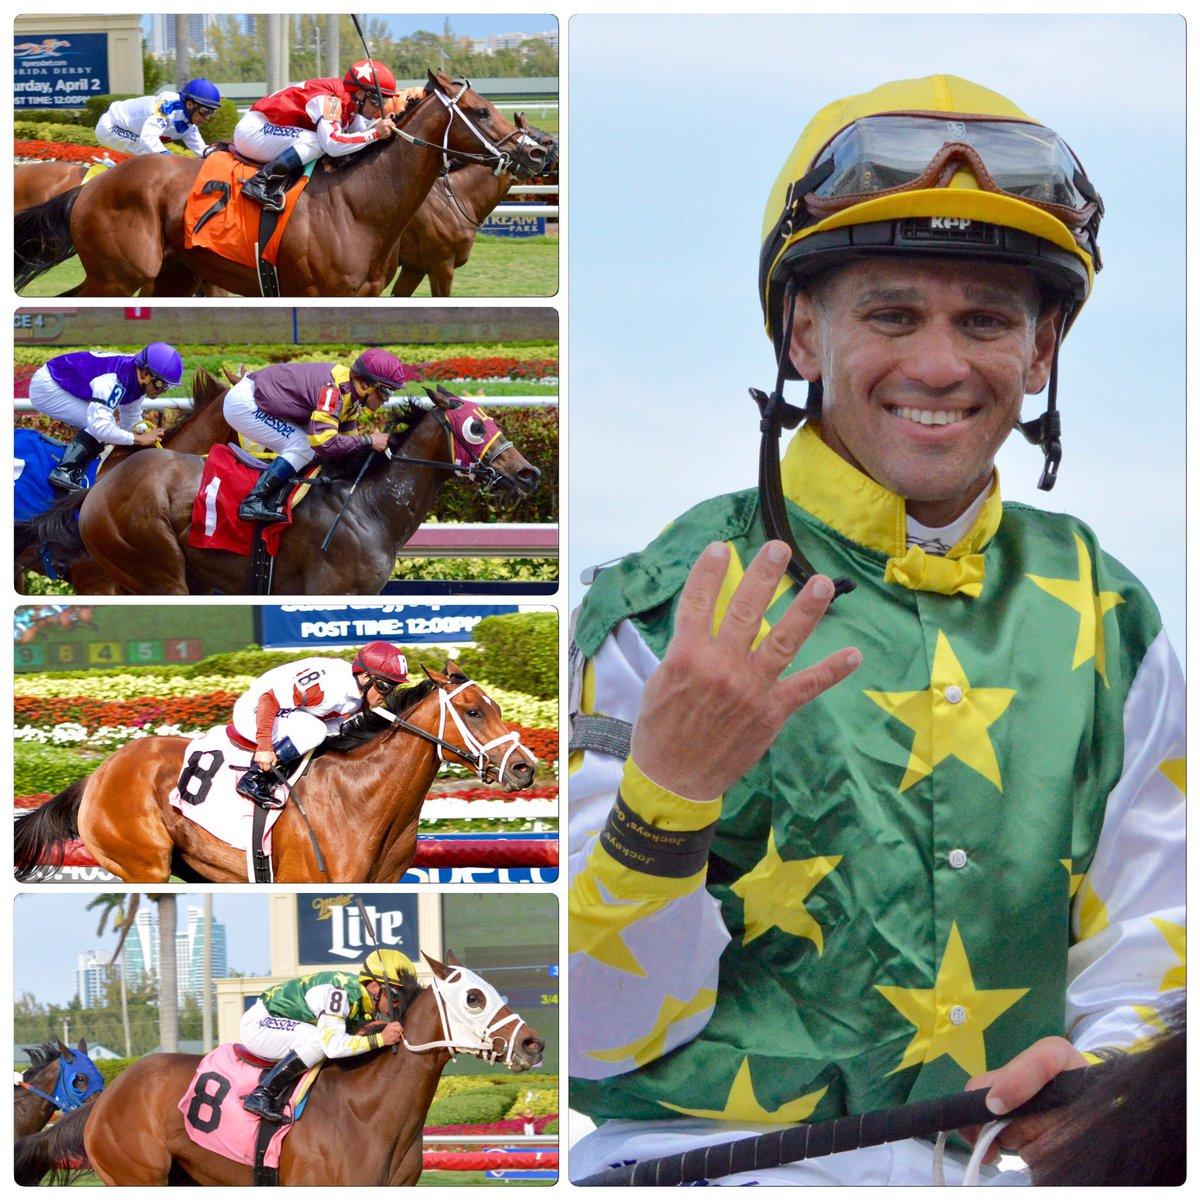 Four wins today for Javier Castellano (@jjcjockey)! Congratulations!